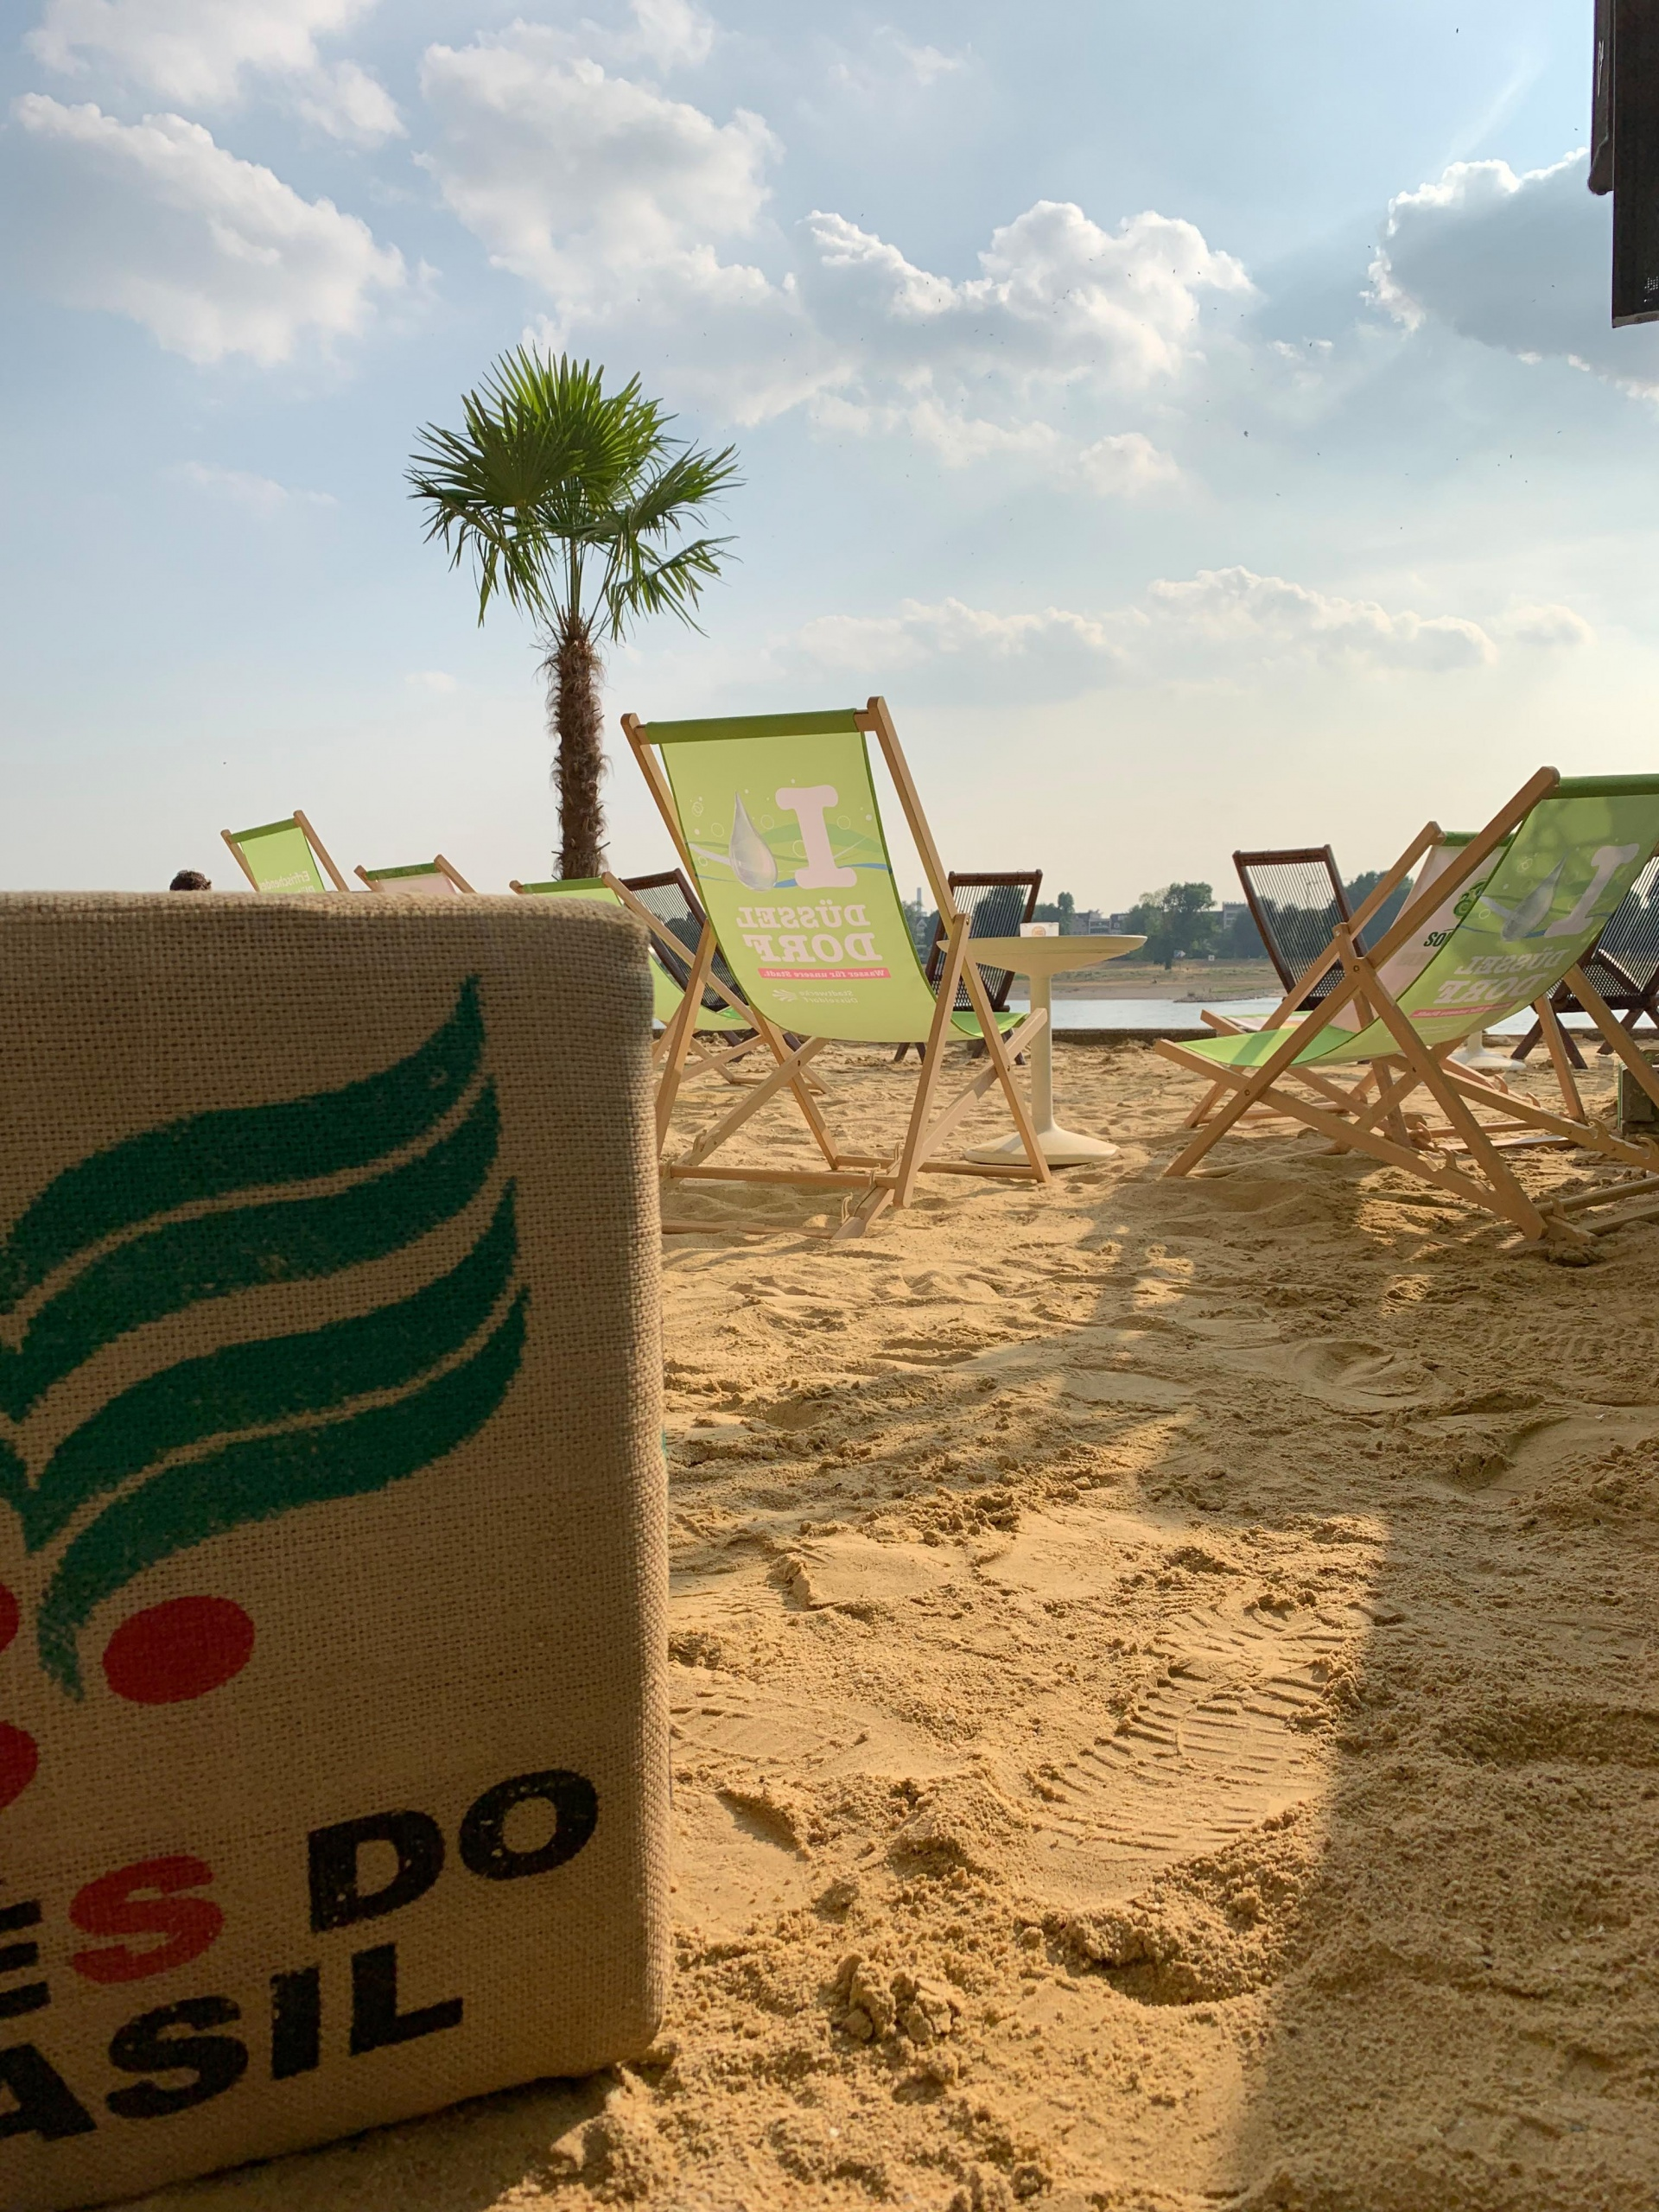 Kino Beach in Düsseldorf öffnet am 15. Juli